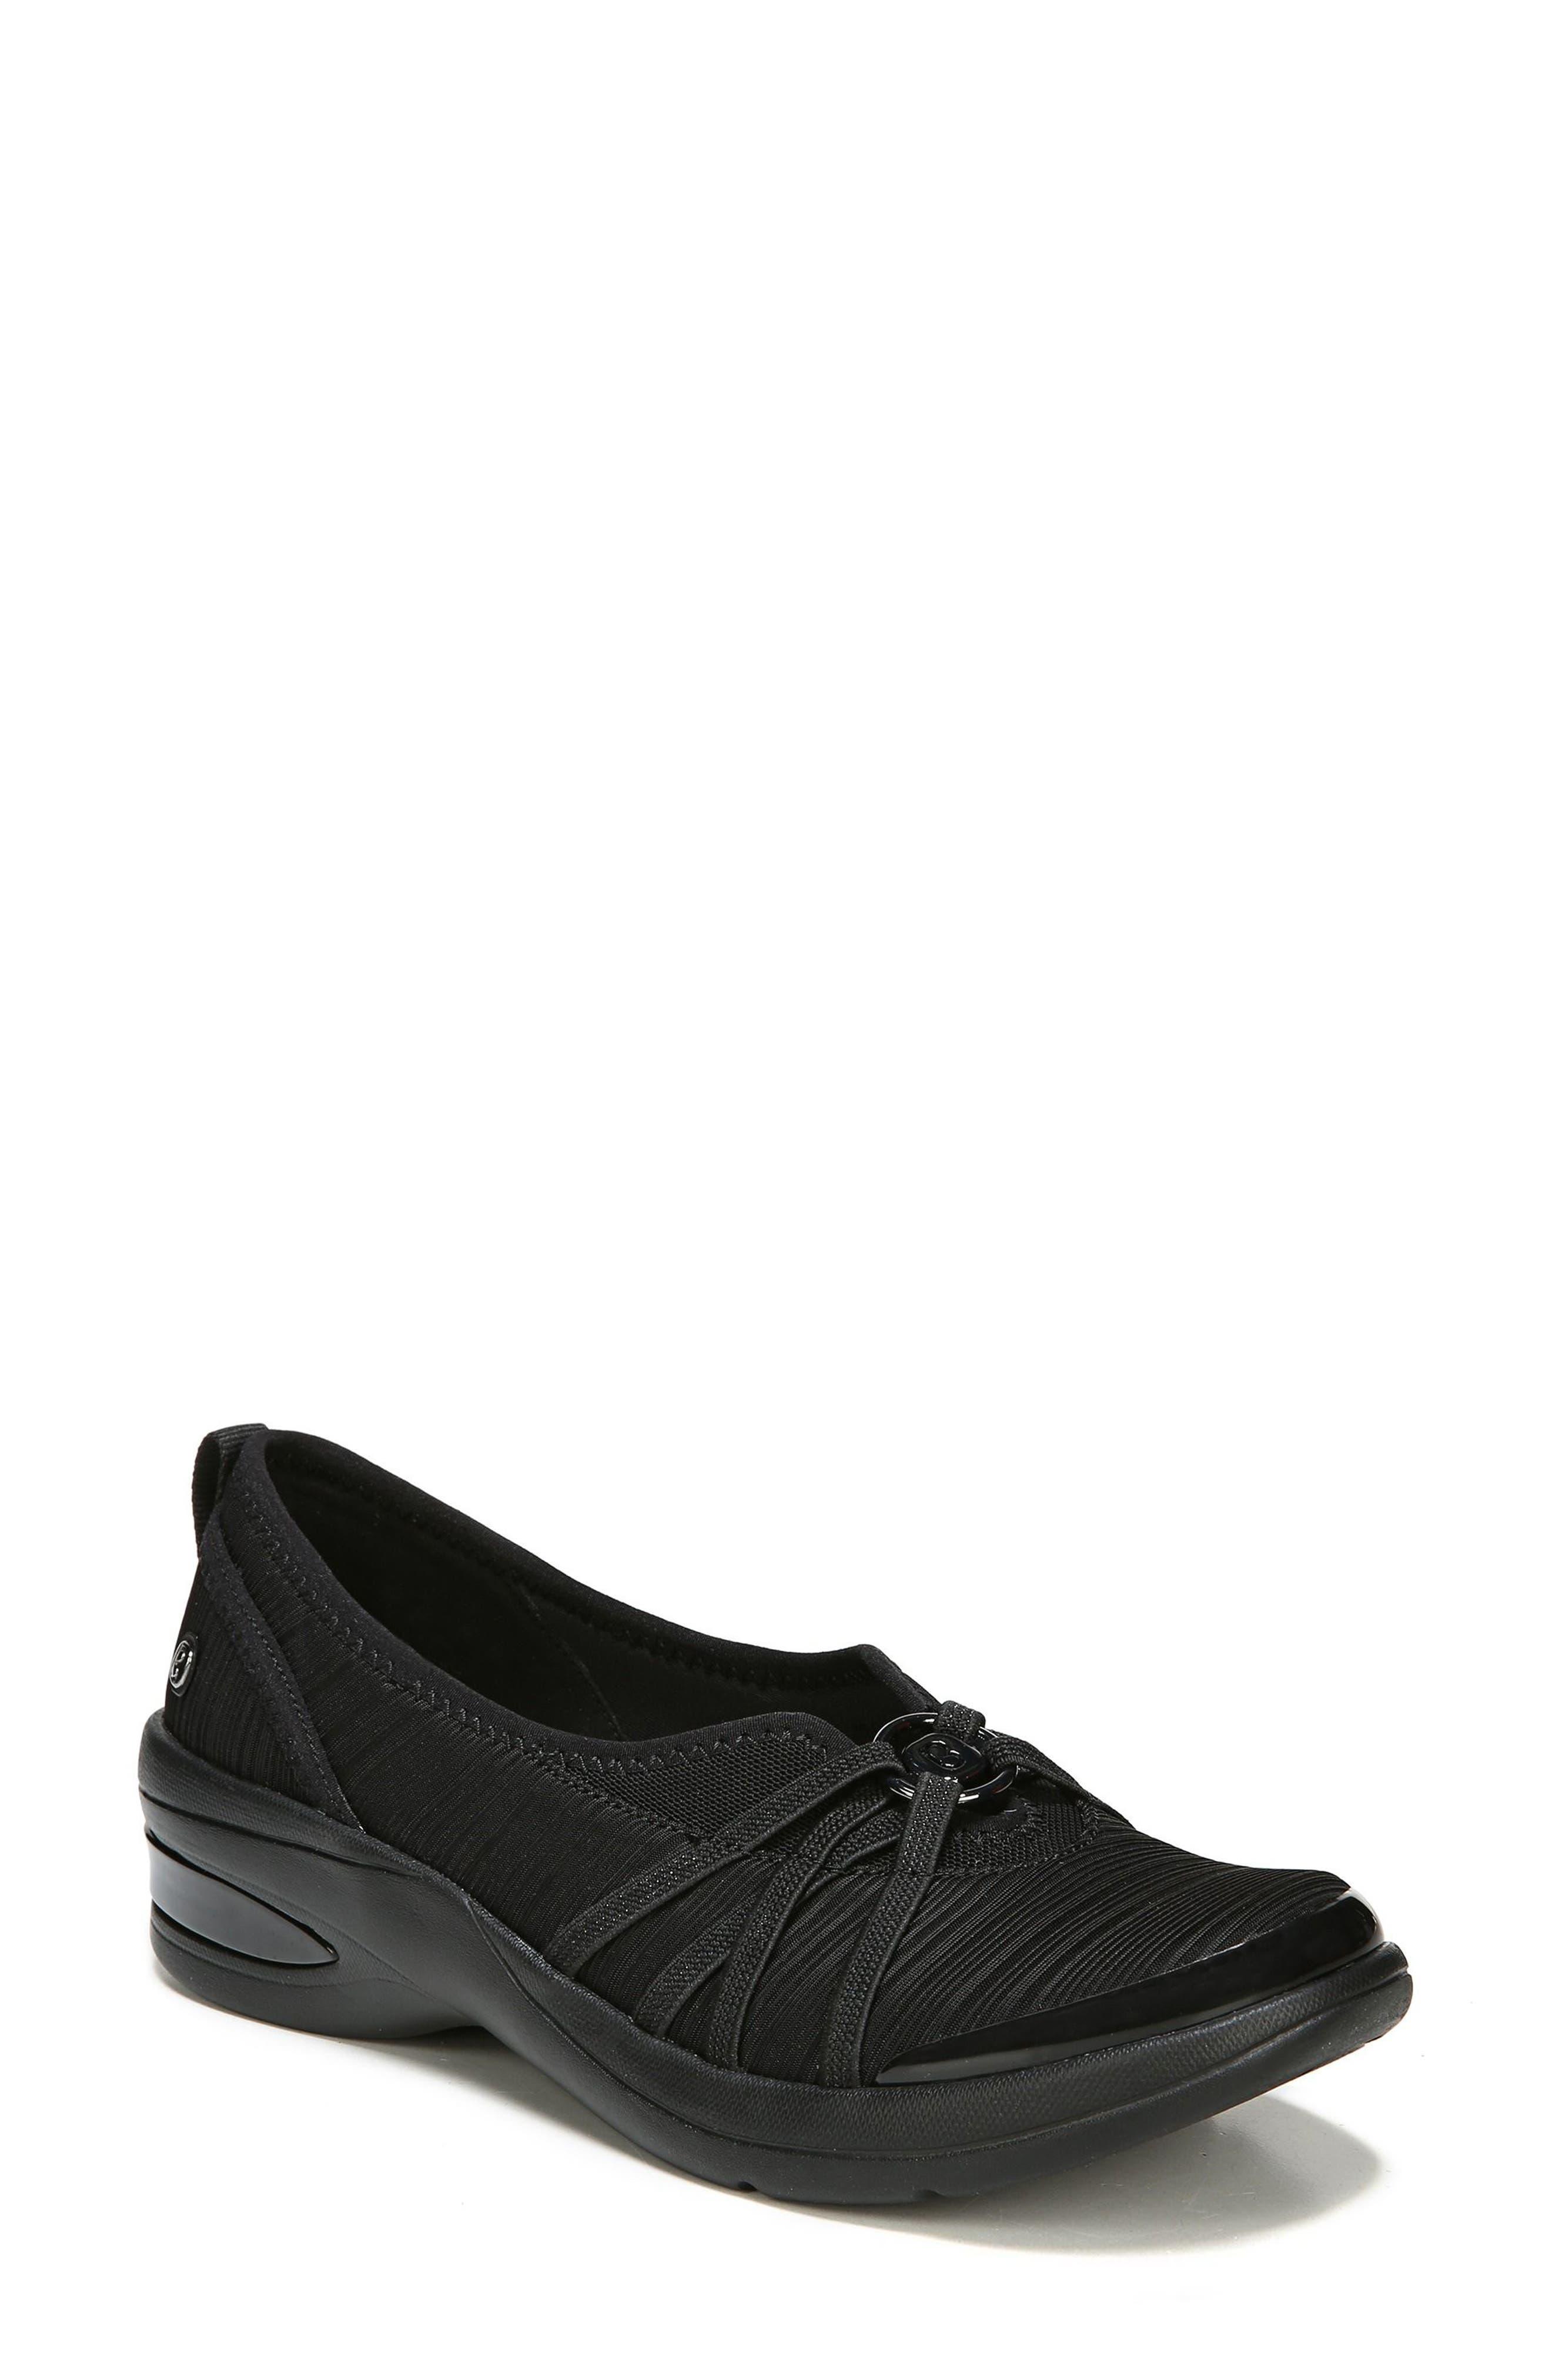 BZEES, Rosie Sneaker, Main thumbnail 1, color, BLACK GRADIENT FABRIC